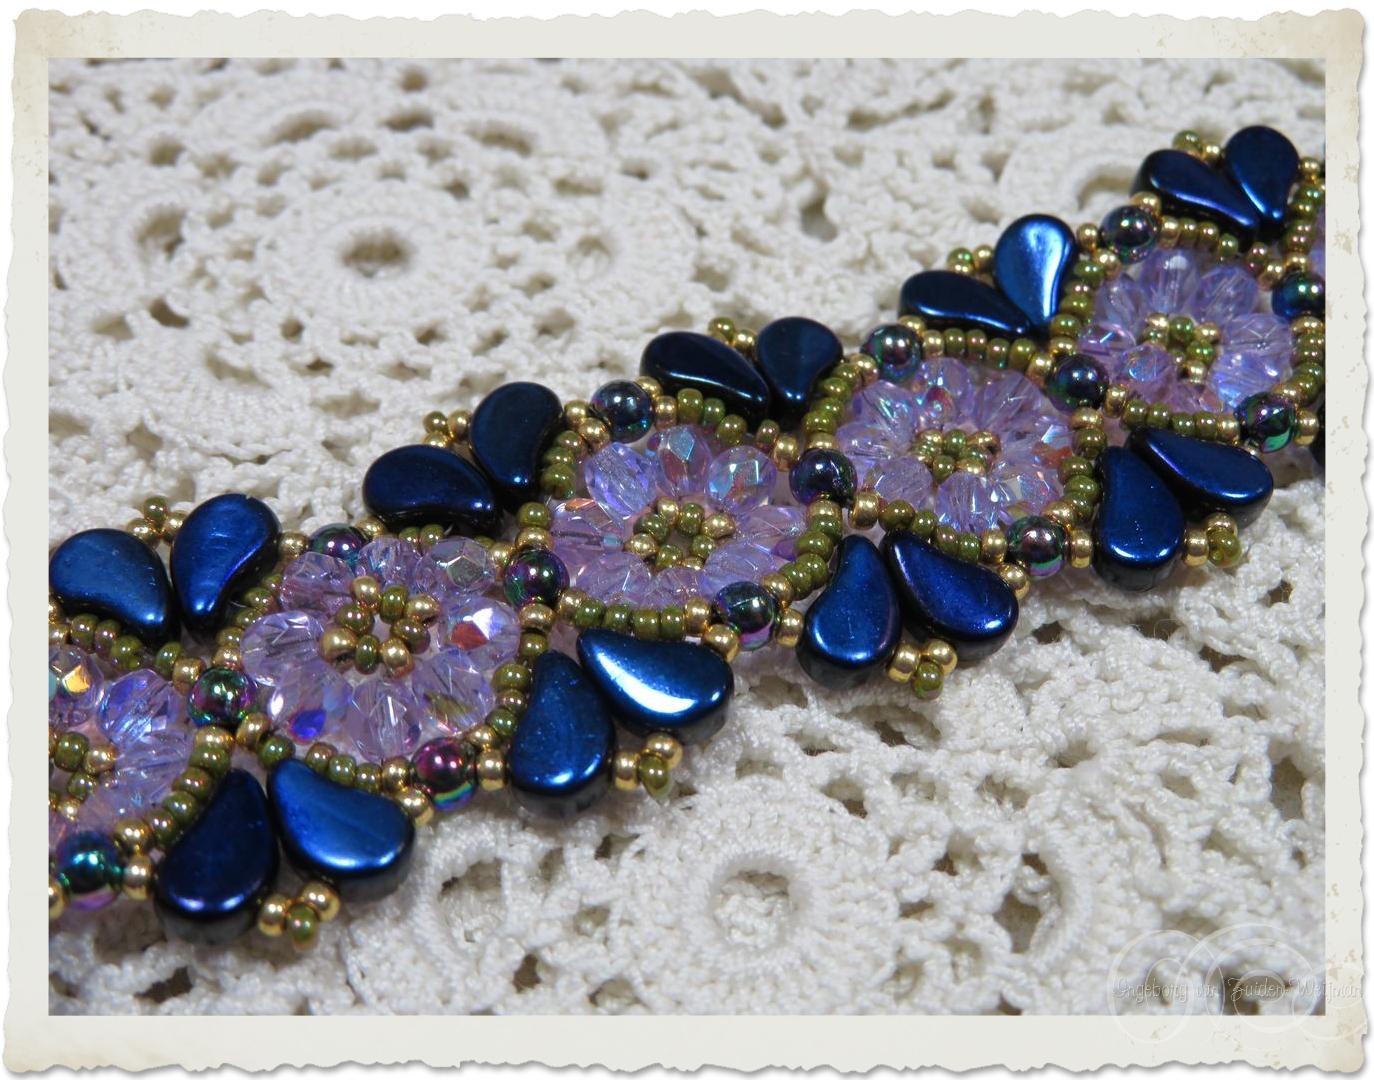 Handmade beadweaving bracelet with Czech crystals and Paisley duo beads by Ingeborg van Zuiden